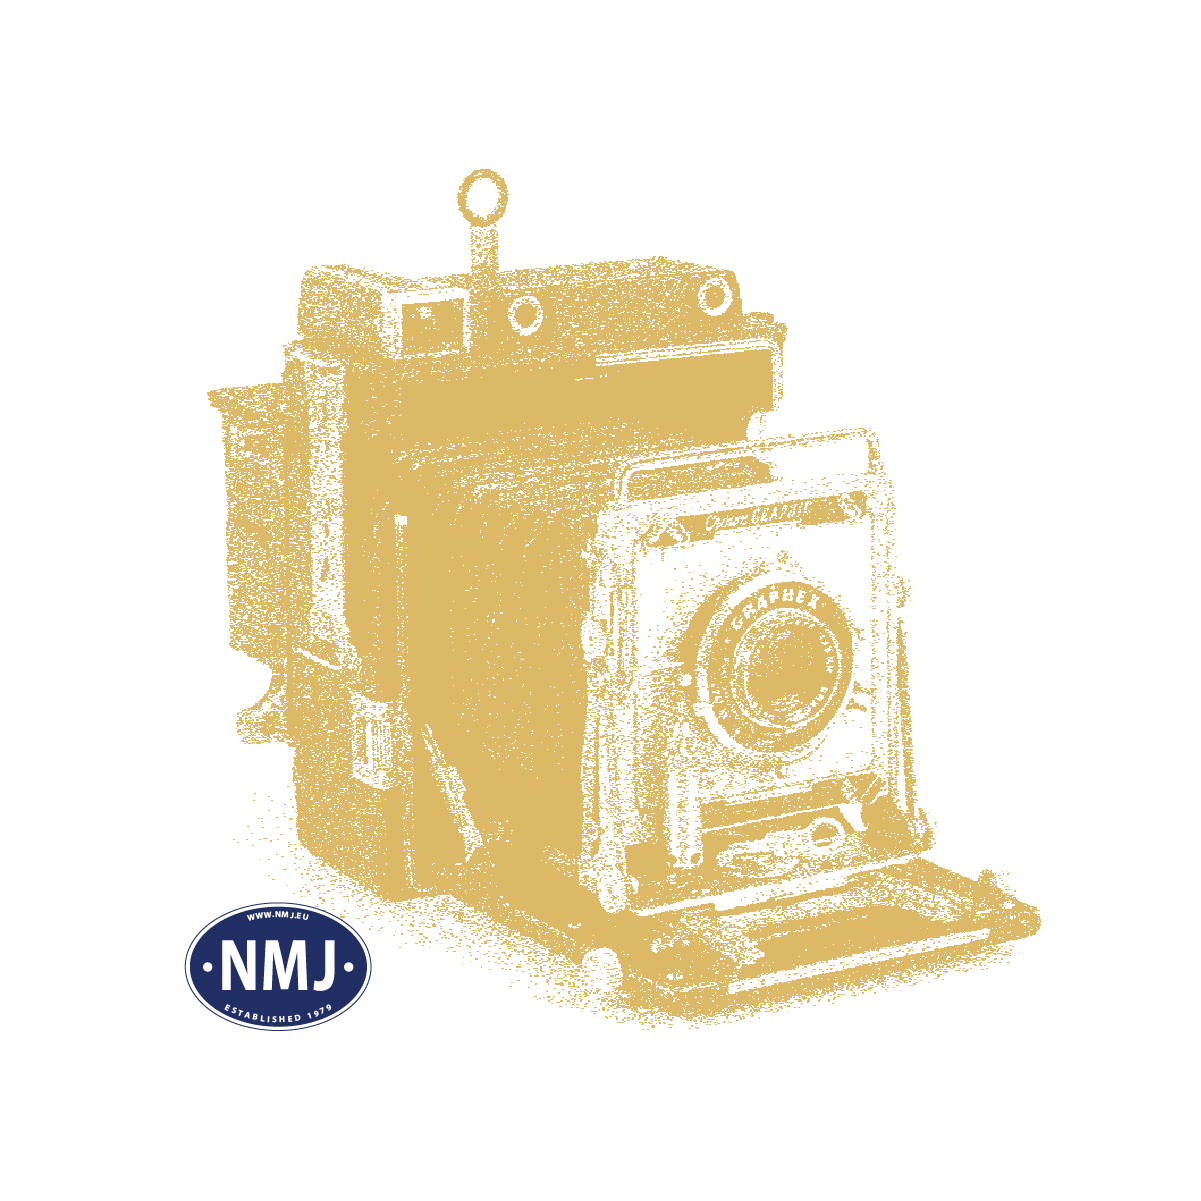 NMJT604.504 - NMJ Topline HNJ G 1624